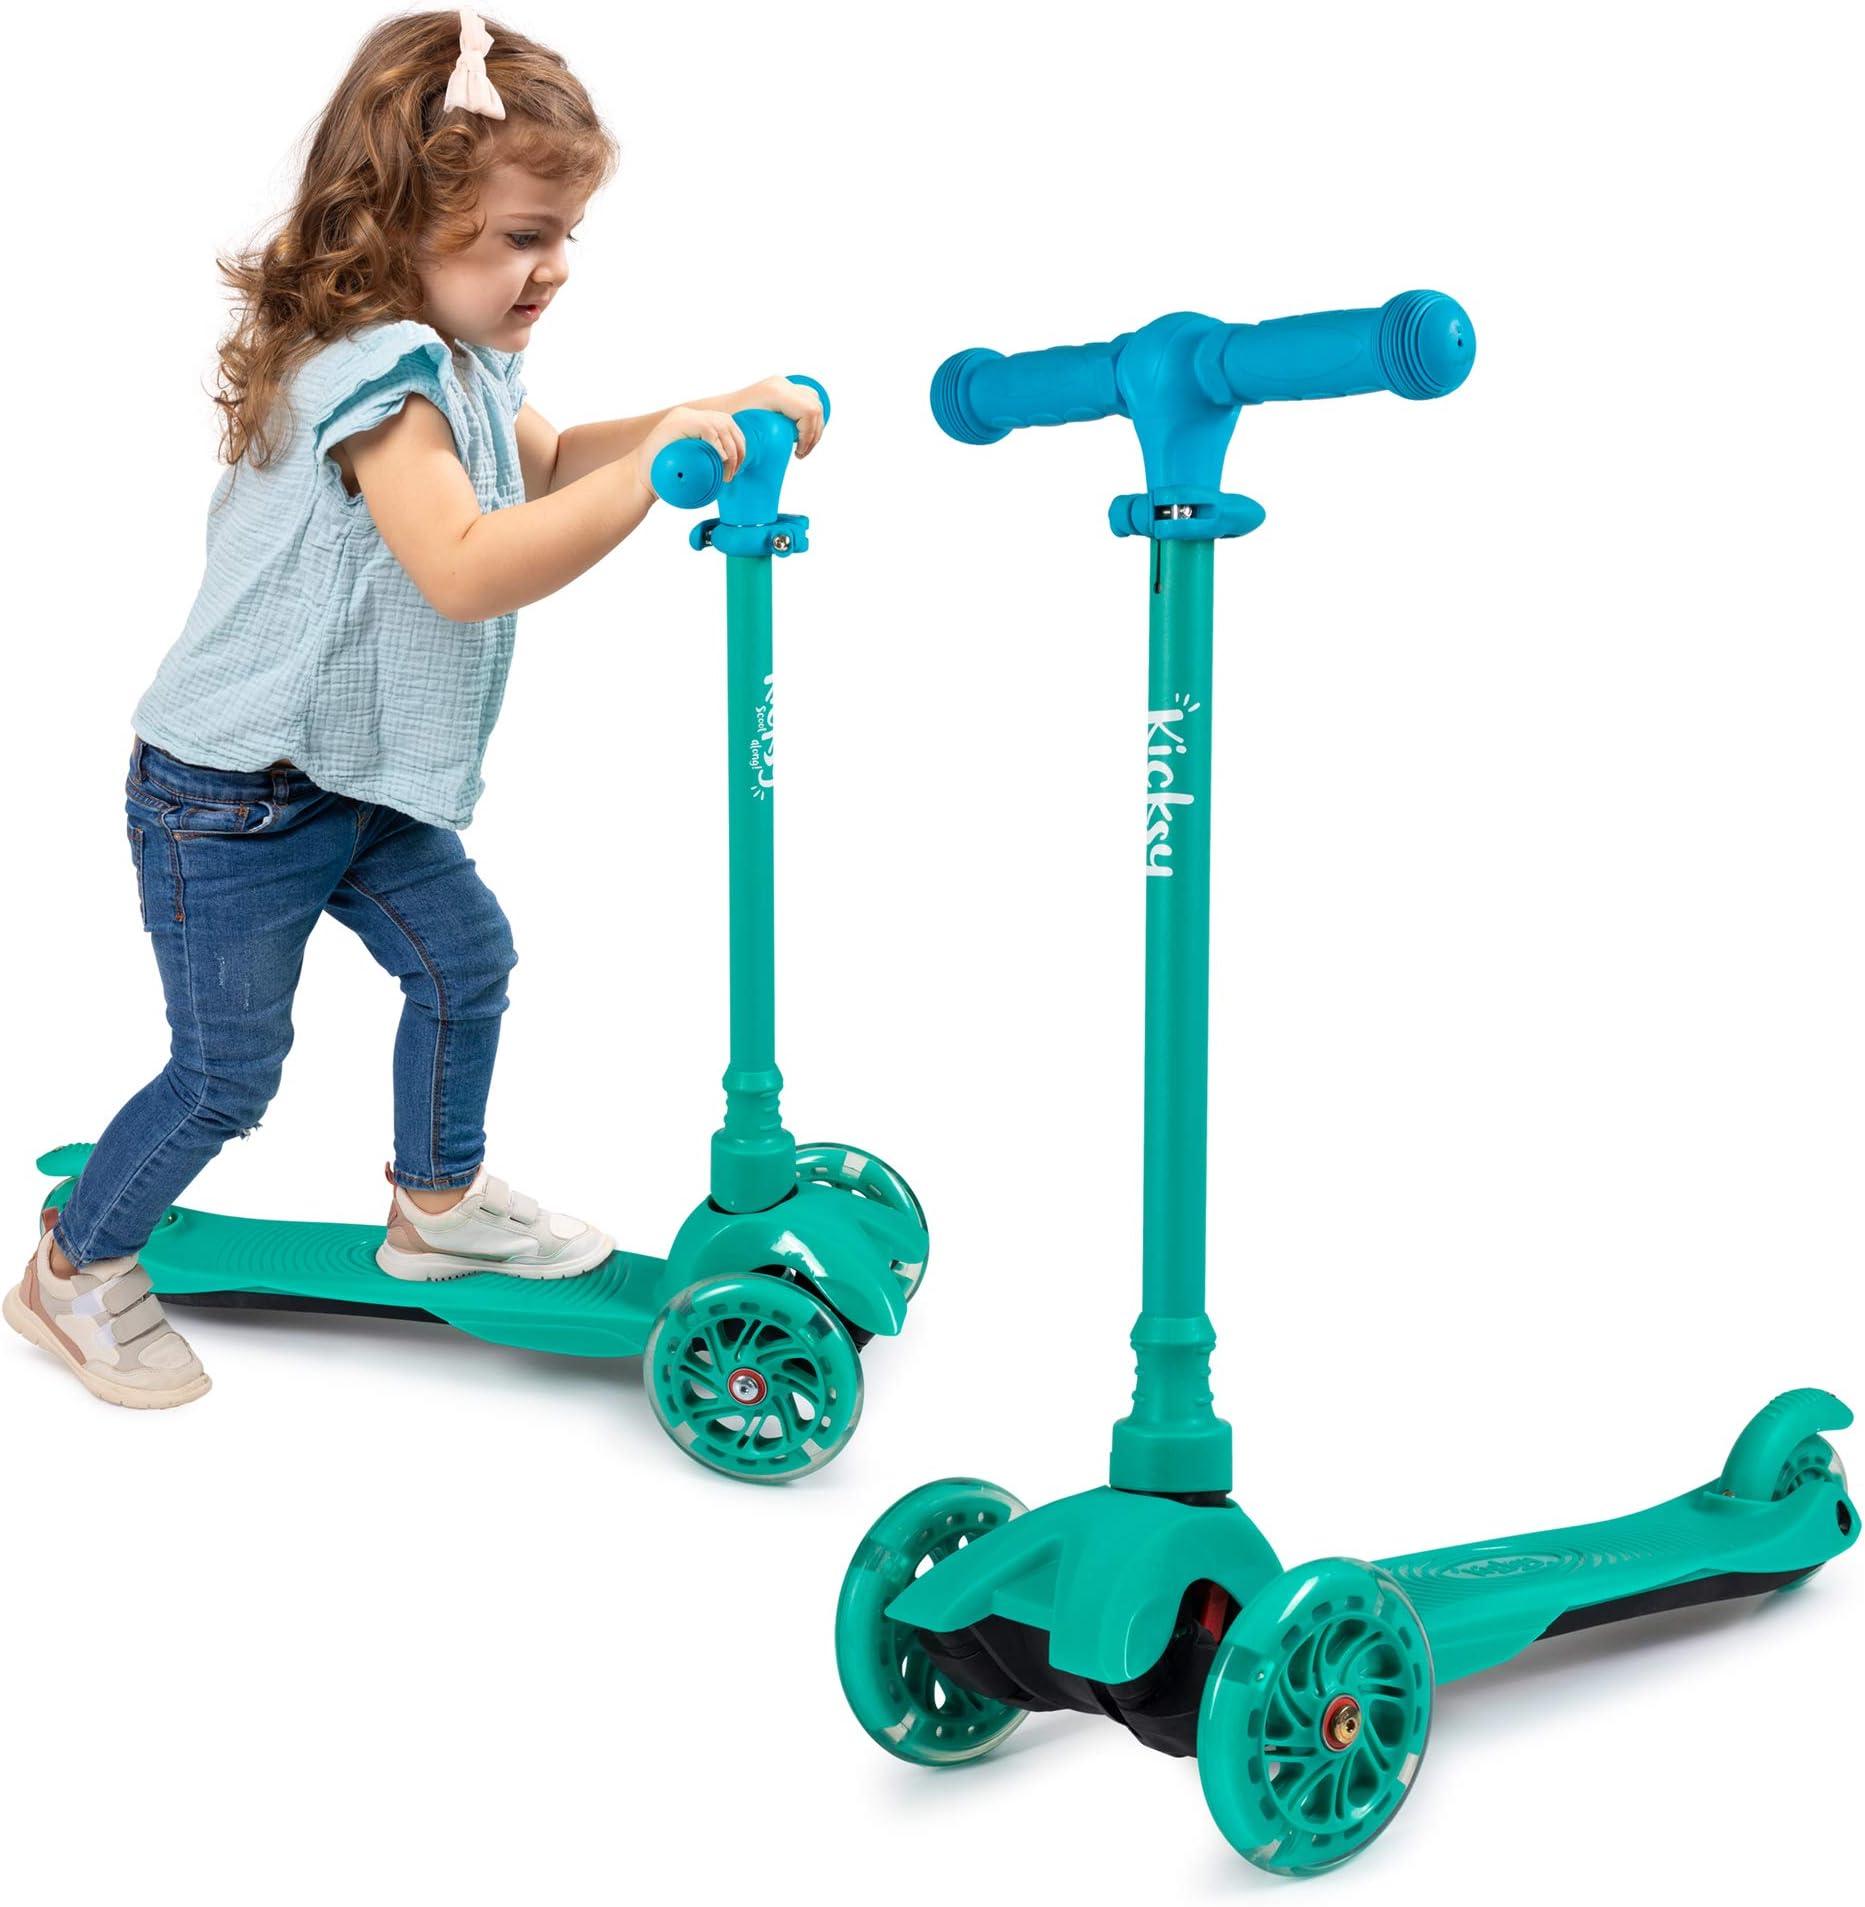 Kids Folding Kick Scooter For Girls Boys Ages 3-11 Wide Flashing Wheels Phoenix